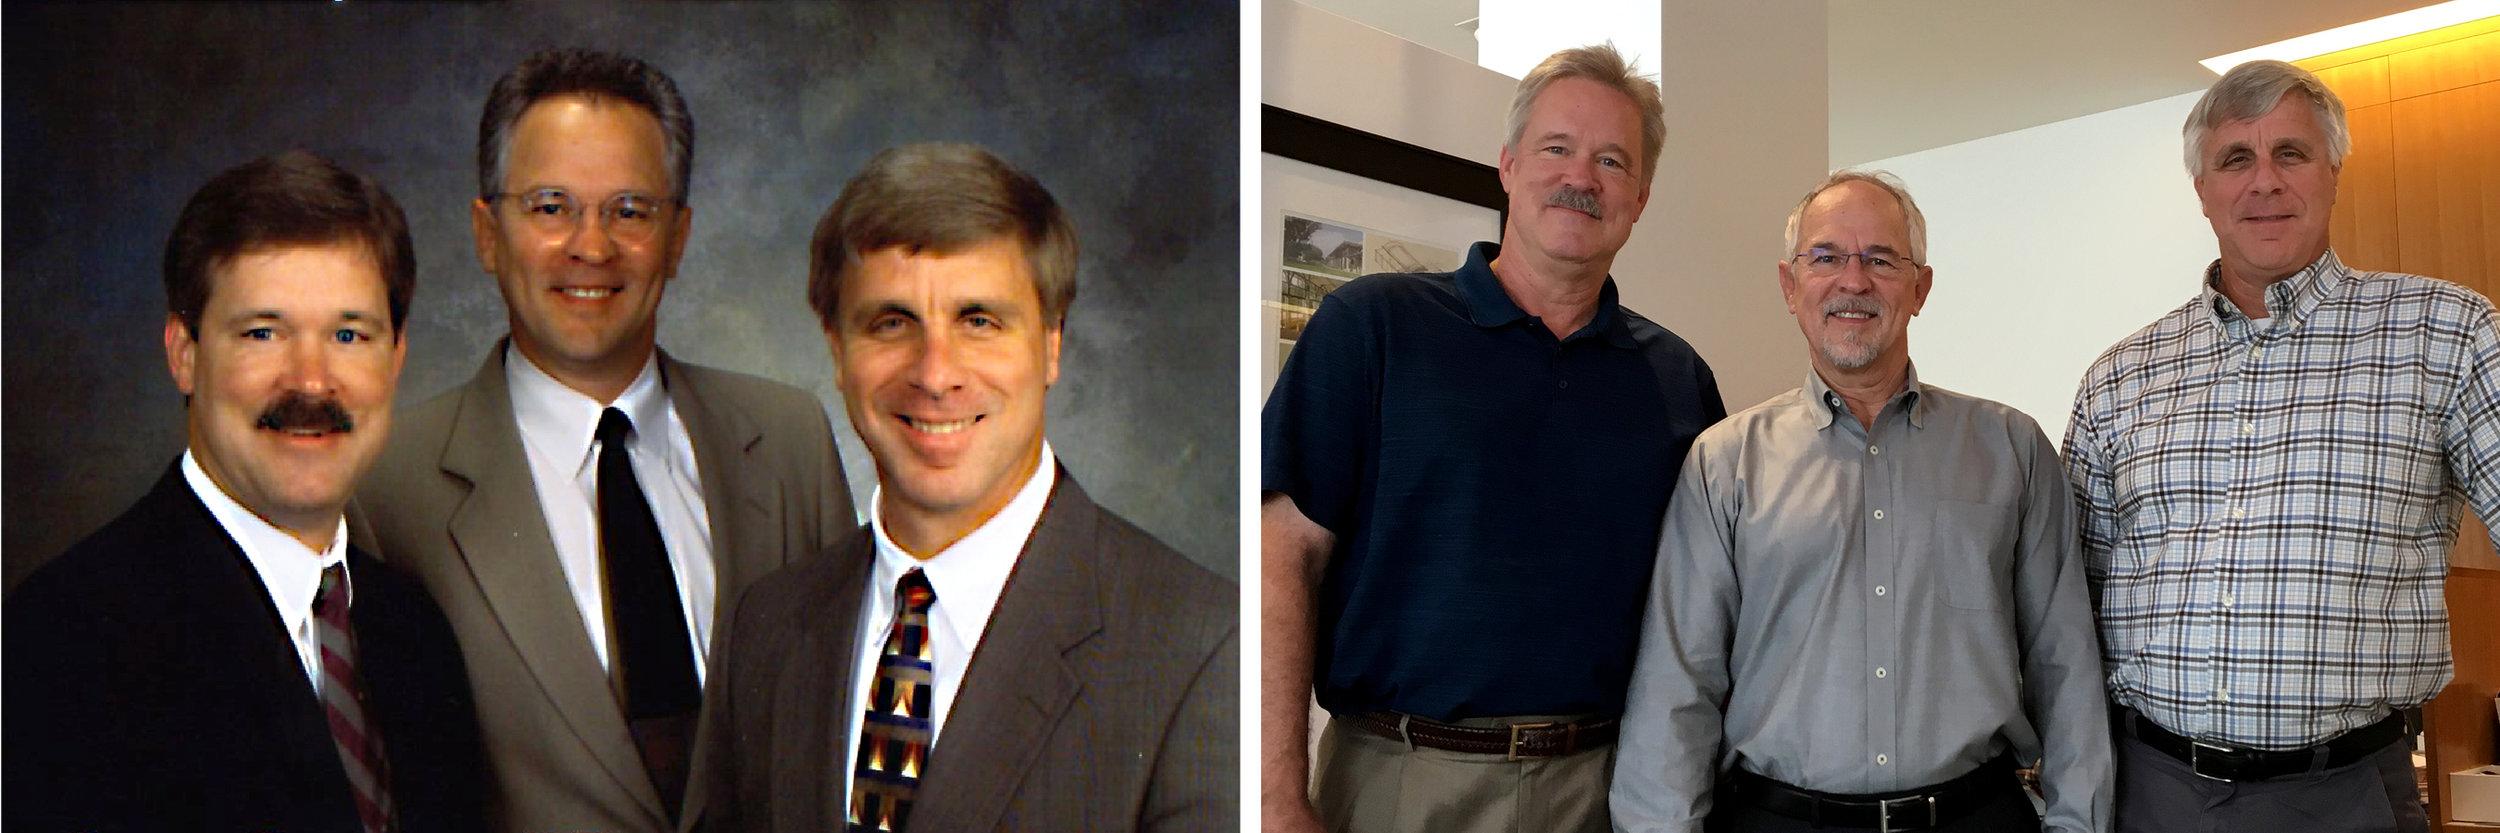 The three original founders: Steve Collier, John Jackson, and Bob Galloway